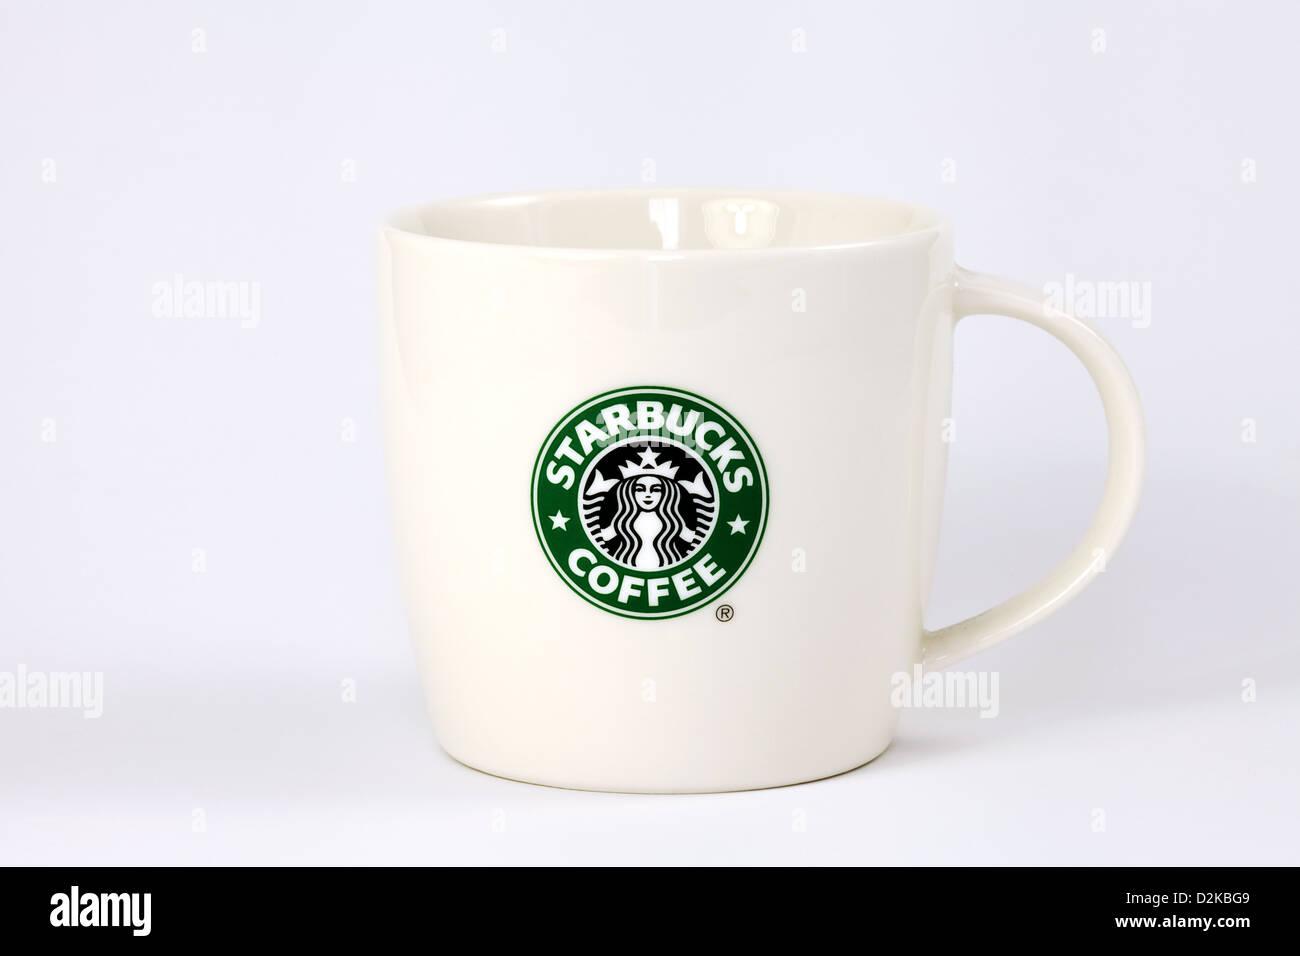 starbucks coffee cup stock photos starbucks coffee cup stock